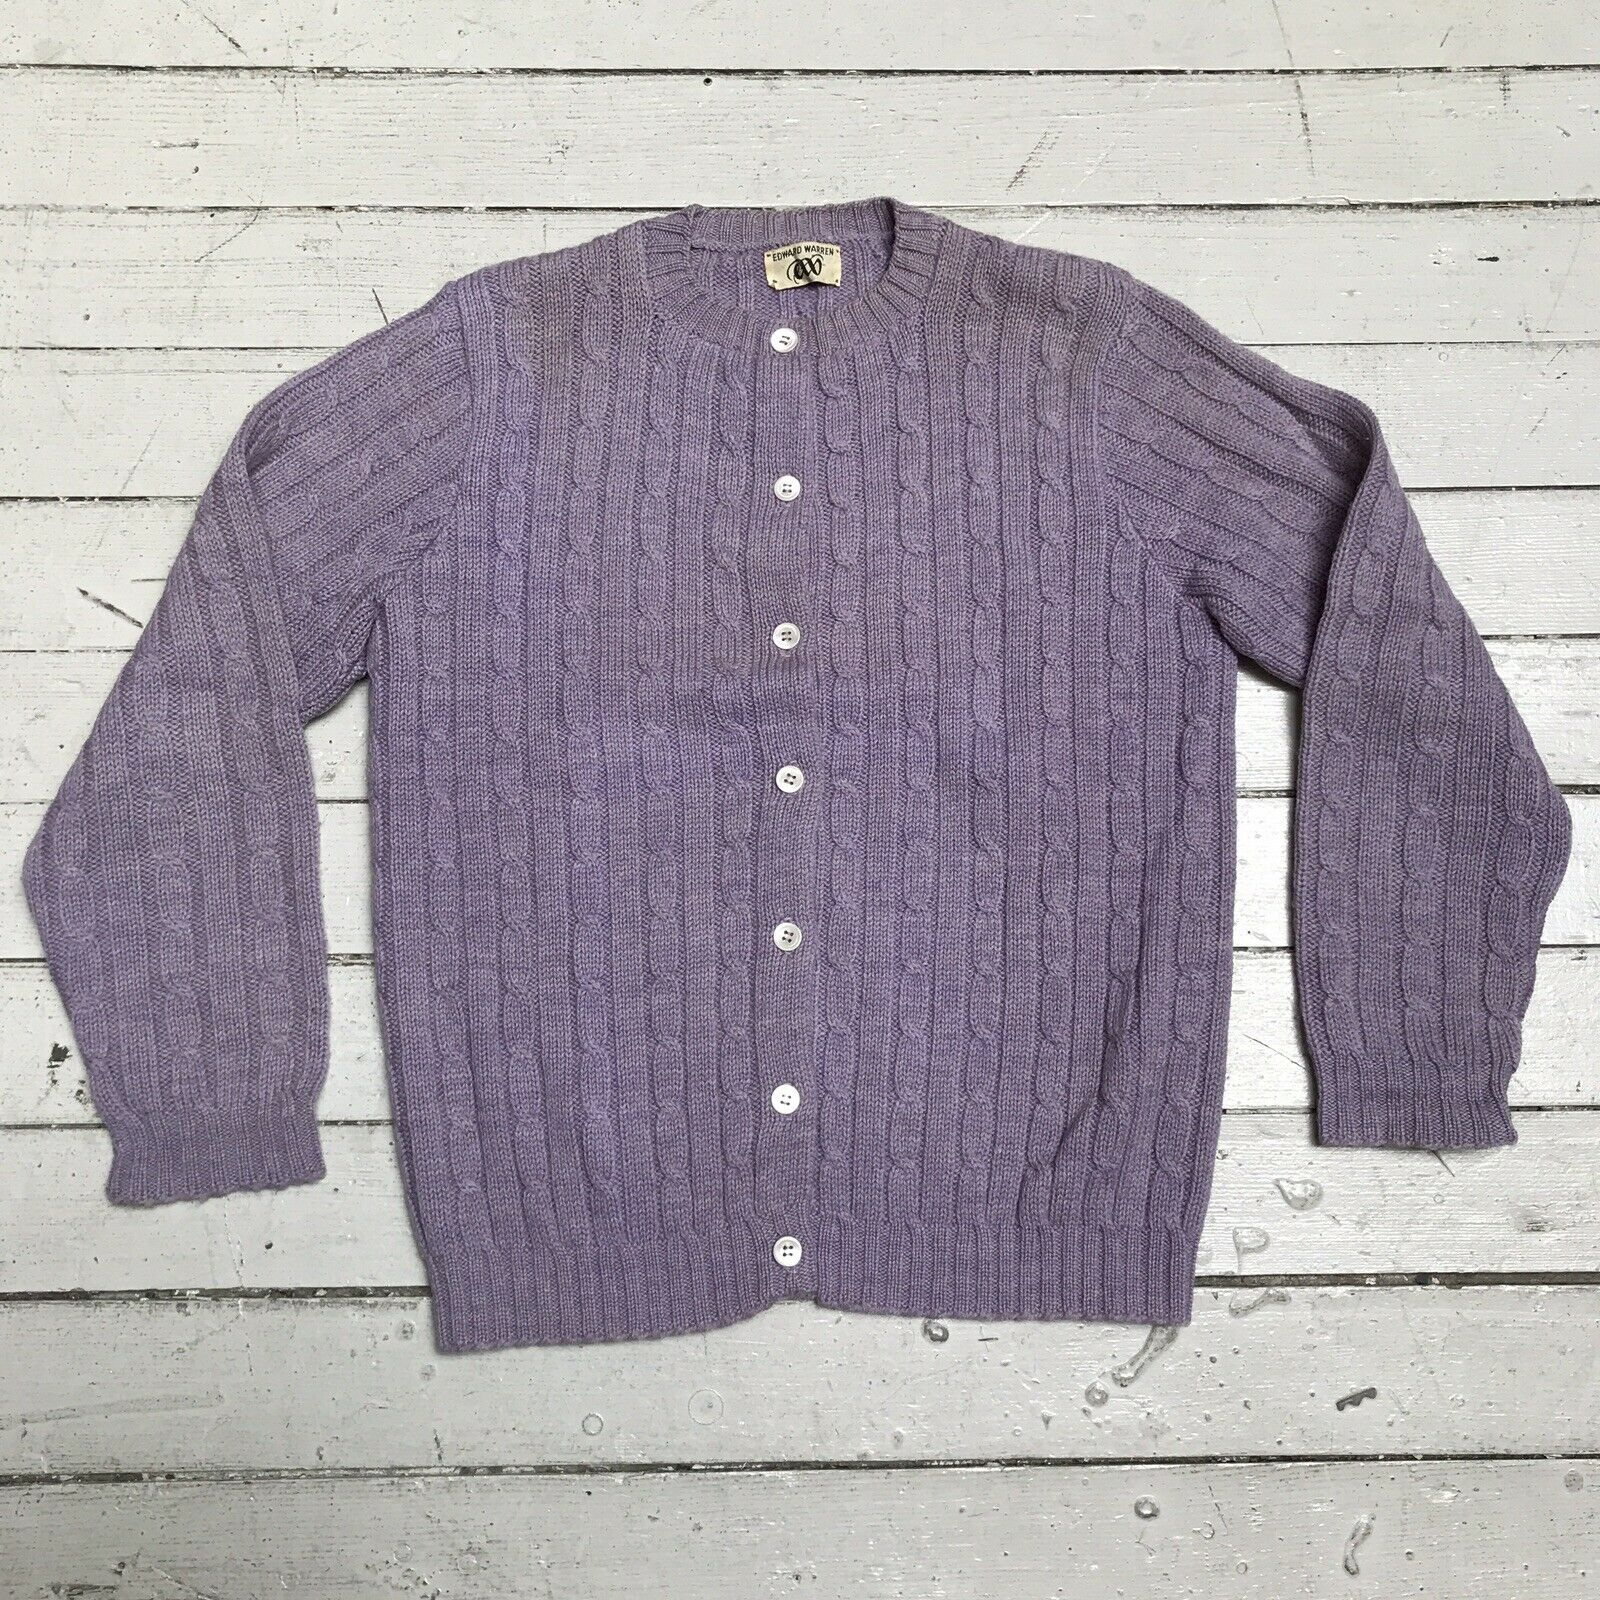 VTG EDWARD WARREN Light Purple Lilac Cable Knit S… - image 1